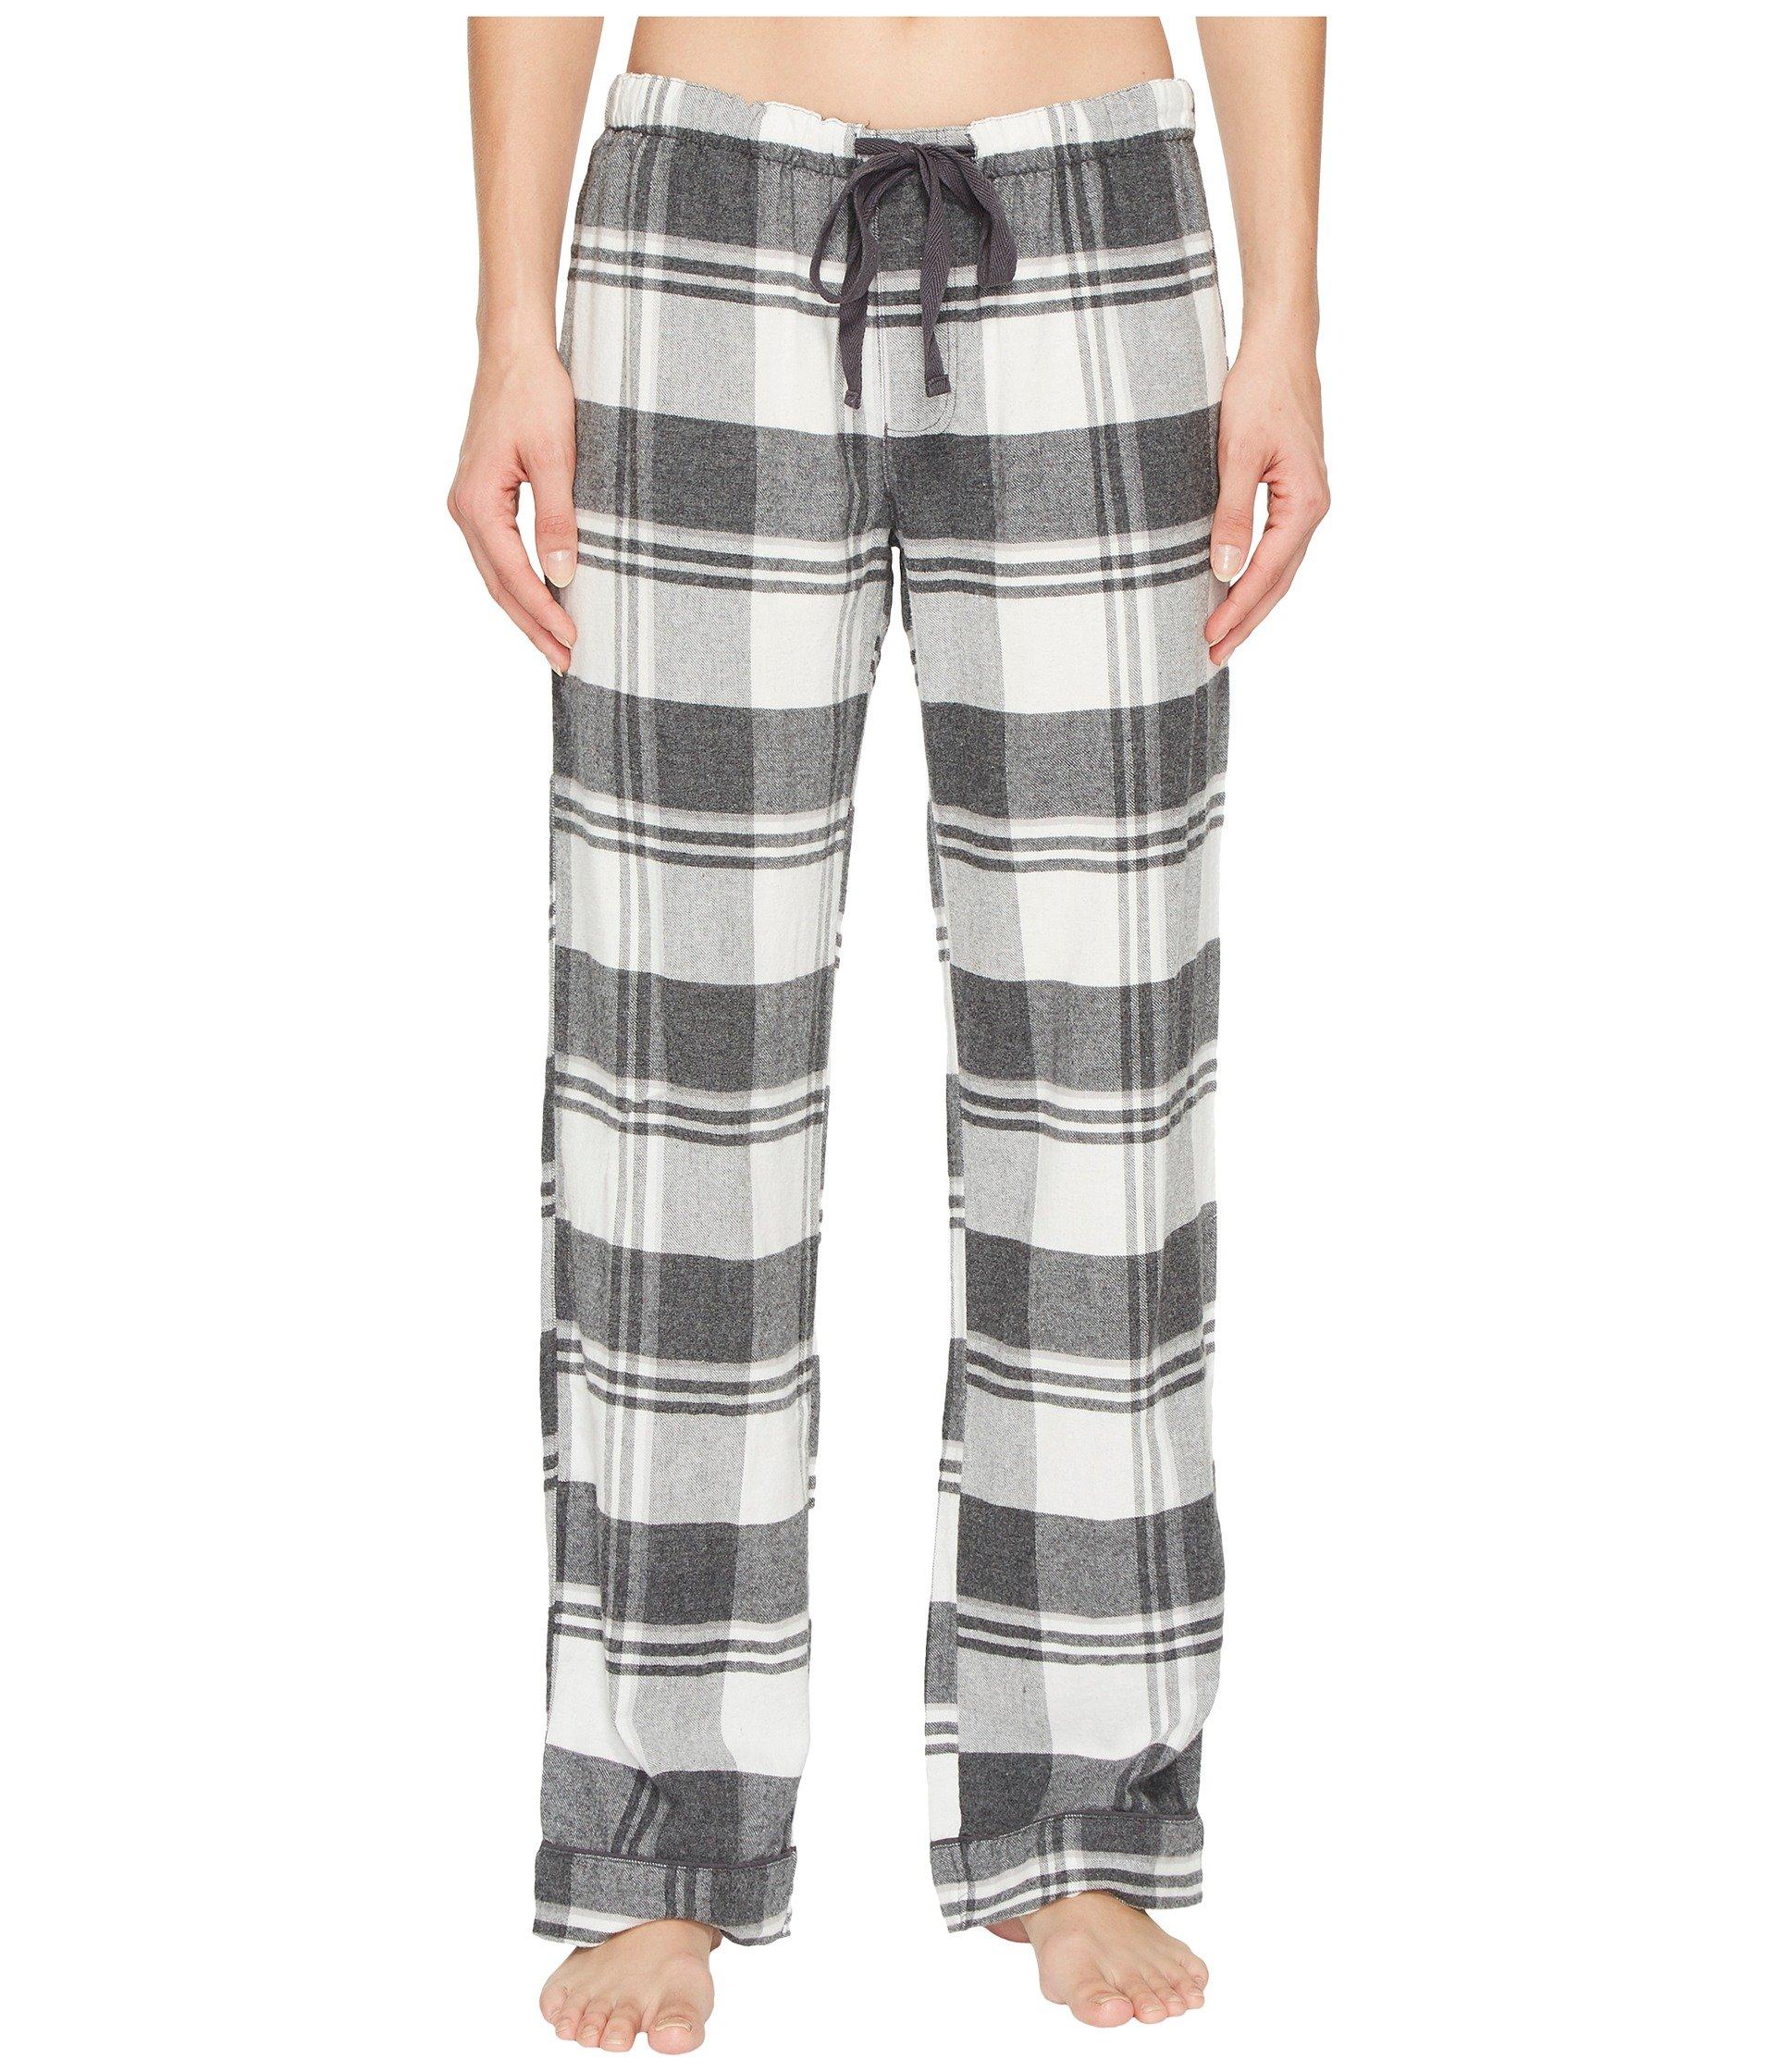 Pantalón de Pijama para Mujer P.J. Salvage Sleigh All Day Checked Pants  + P.J. Salvage en VeoyCompro.net